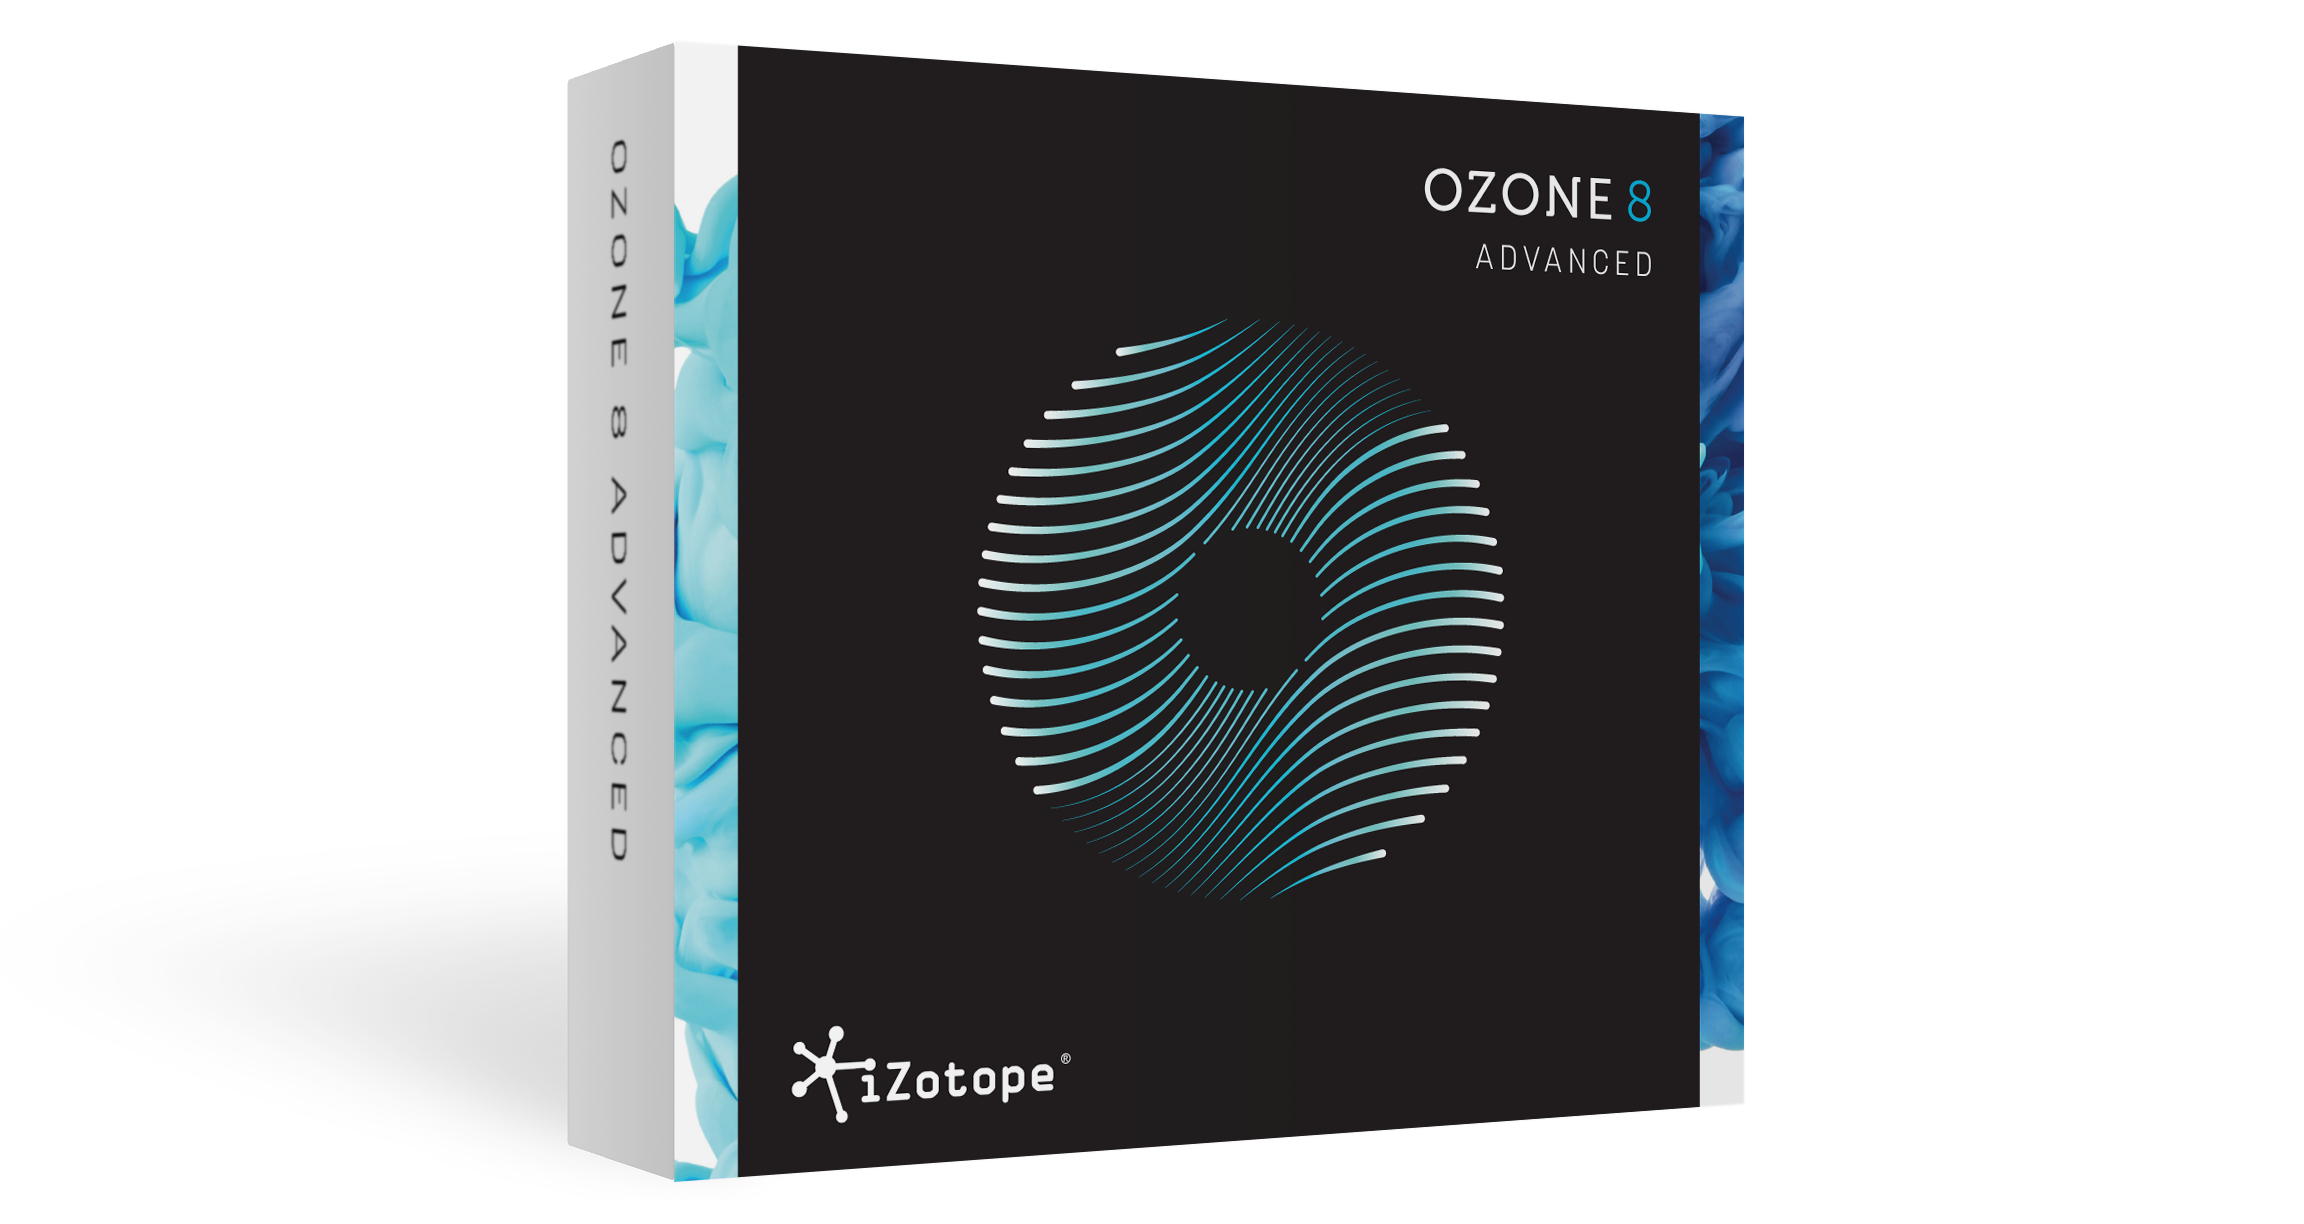 Ozone 8 Advanced For Mac Latest Version Free Download